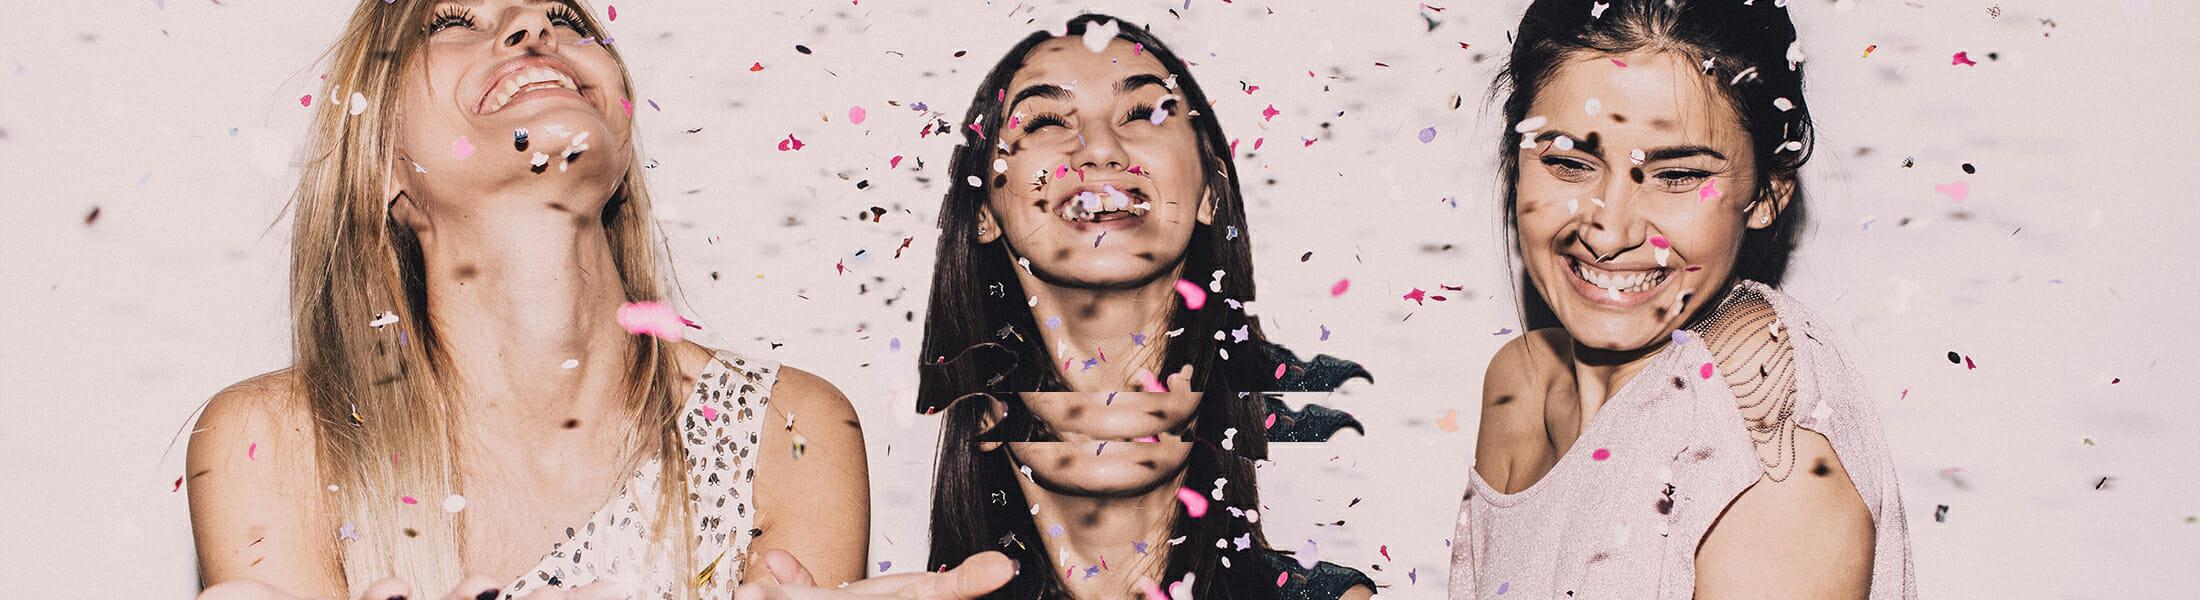 Three women covered in glitter